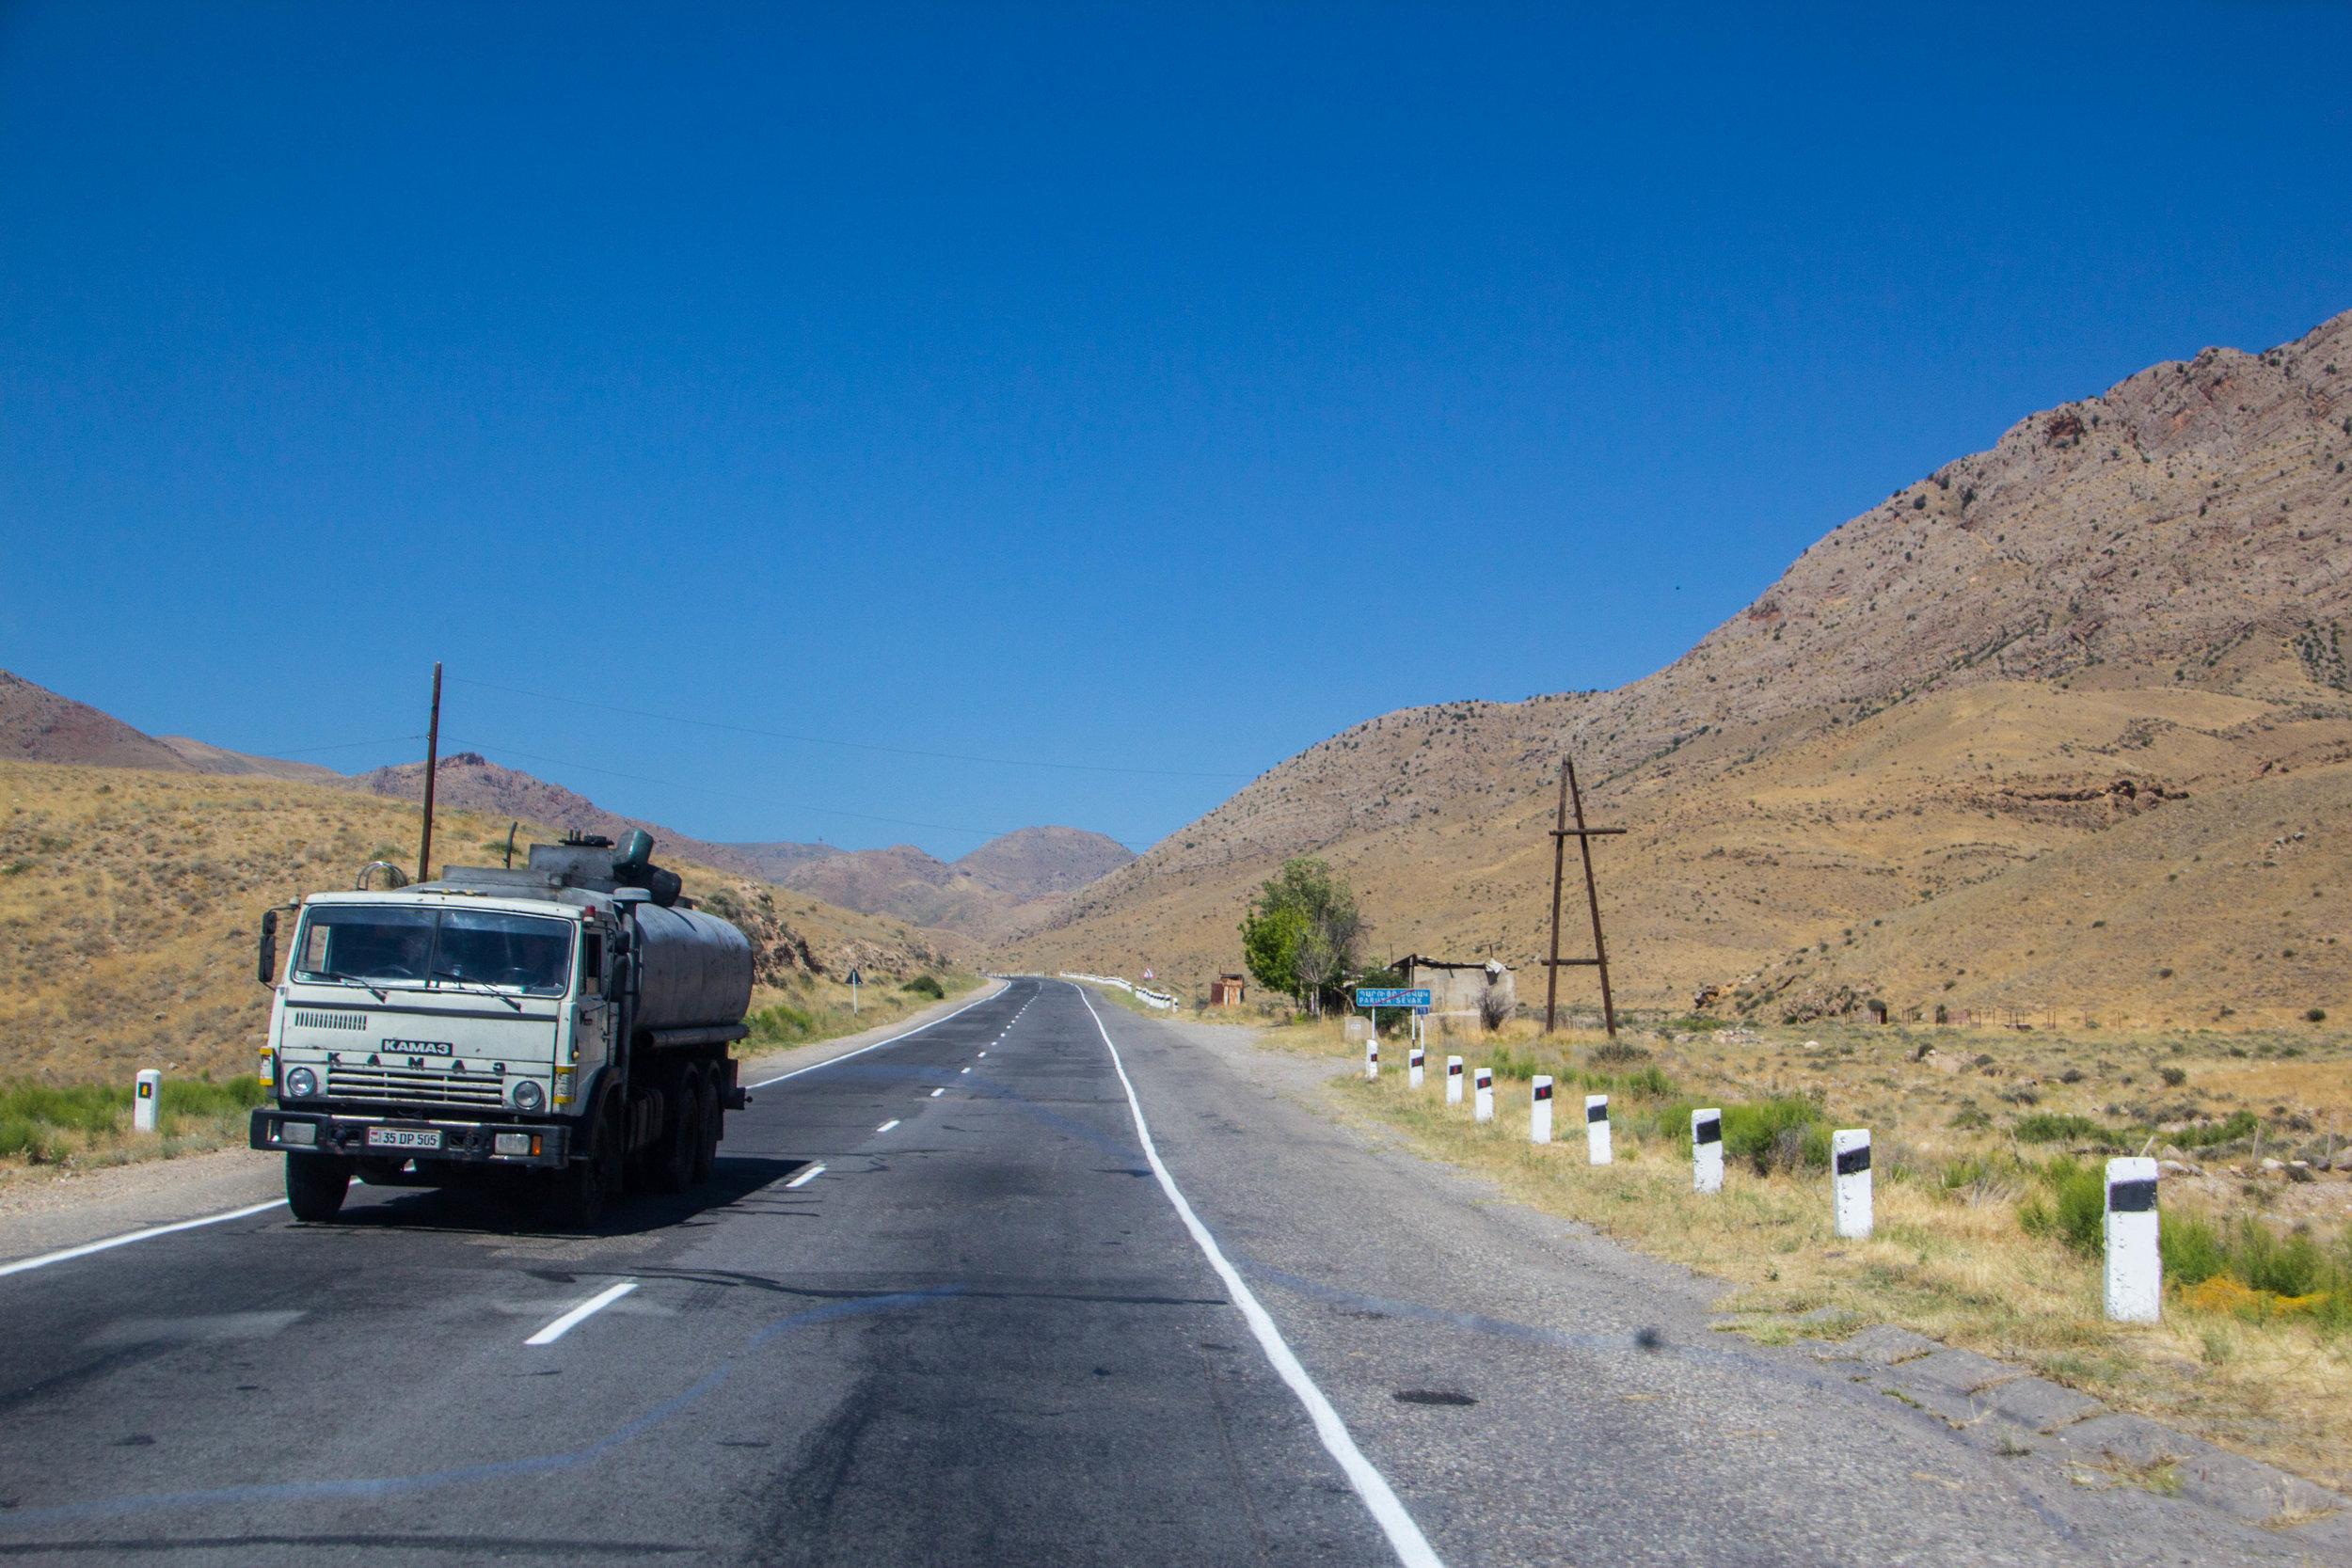 armenia-azerbaijan-southern-border-14.jpg